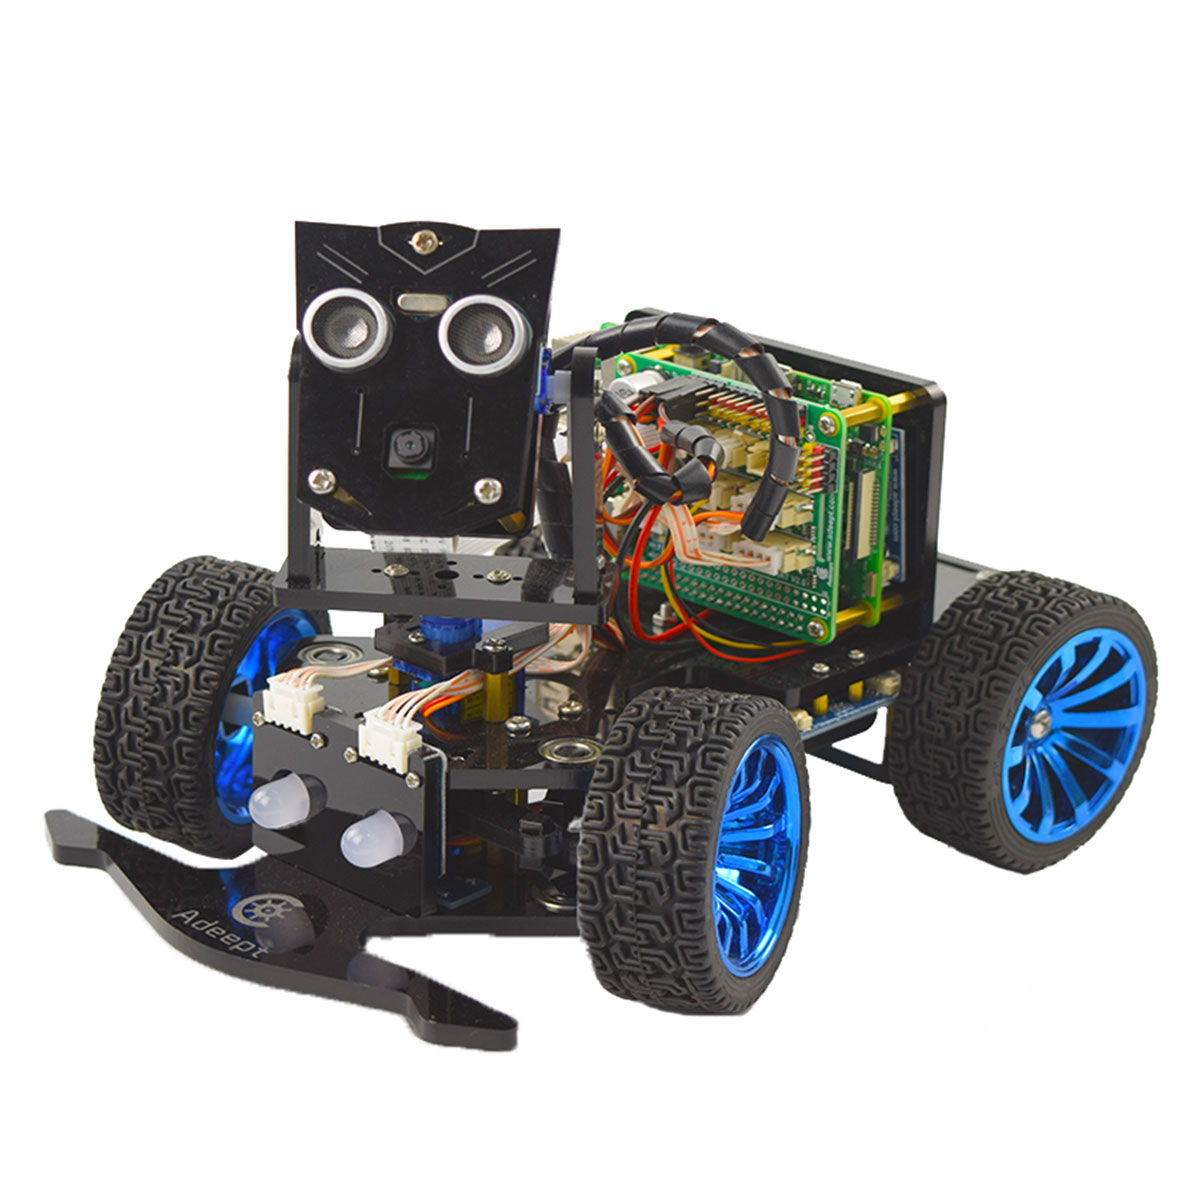 mars rover robot kit - photo #3